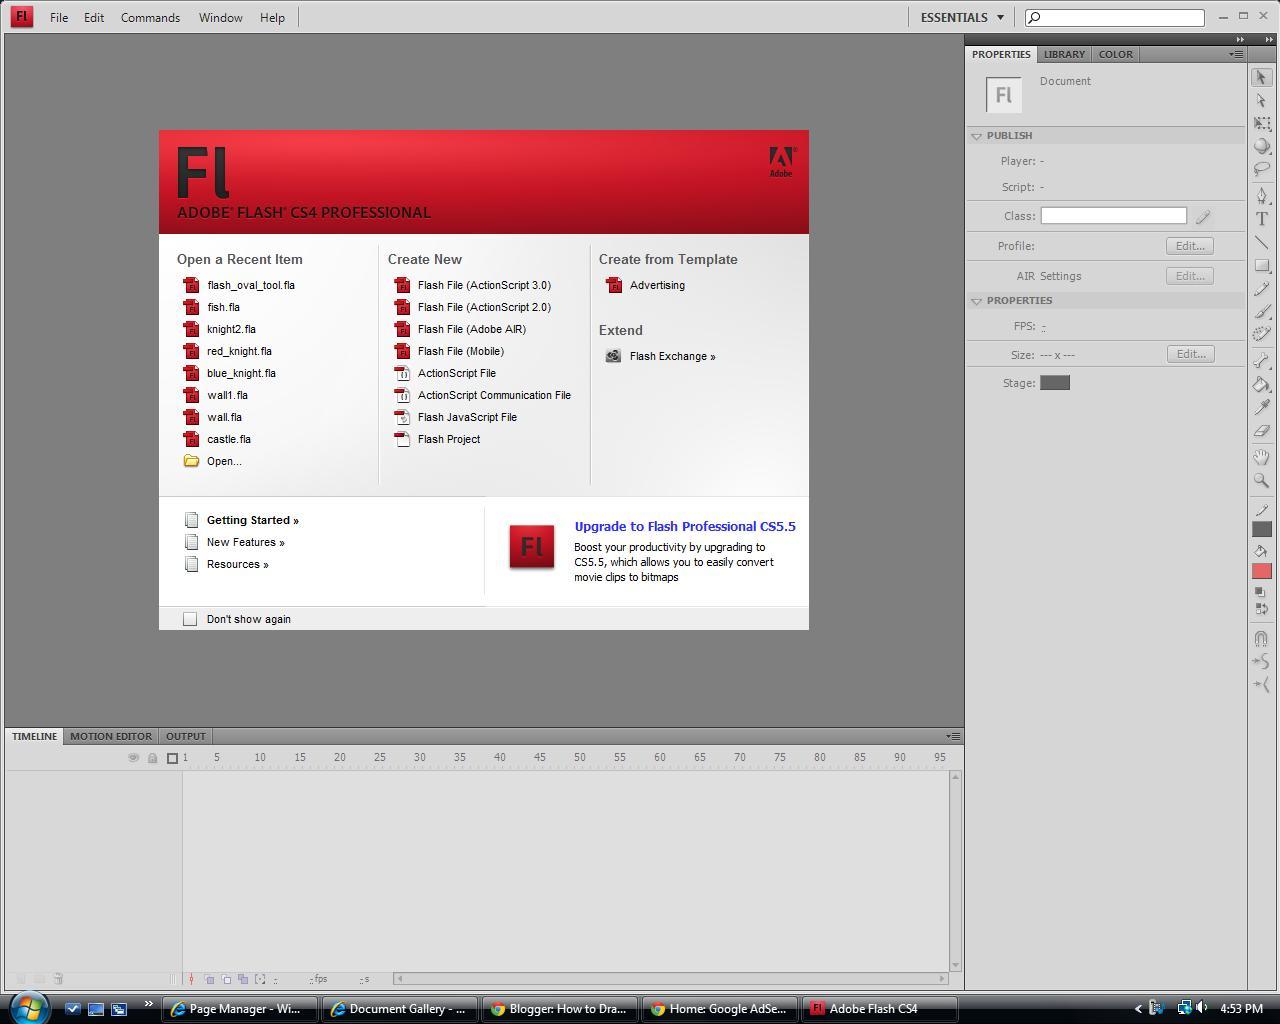 Adobe dreamweaver cs5.5 buy fast